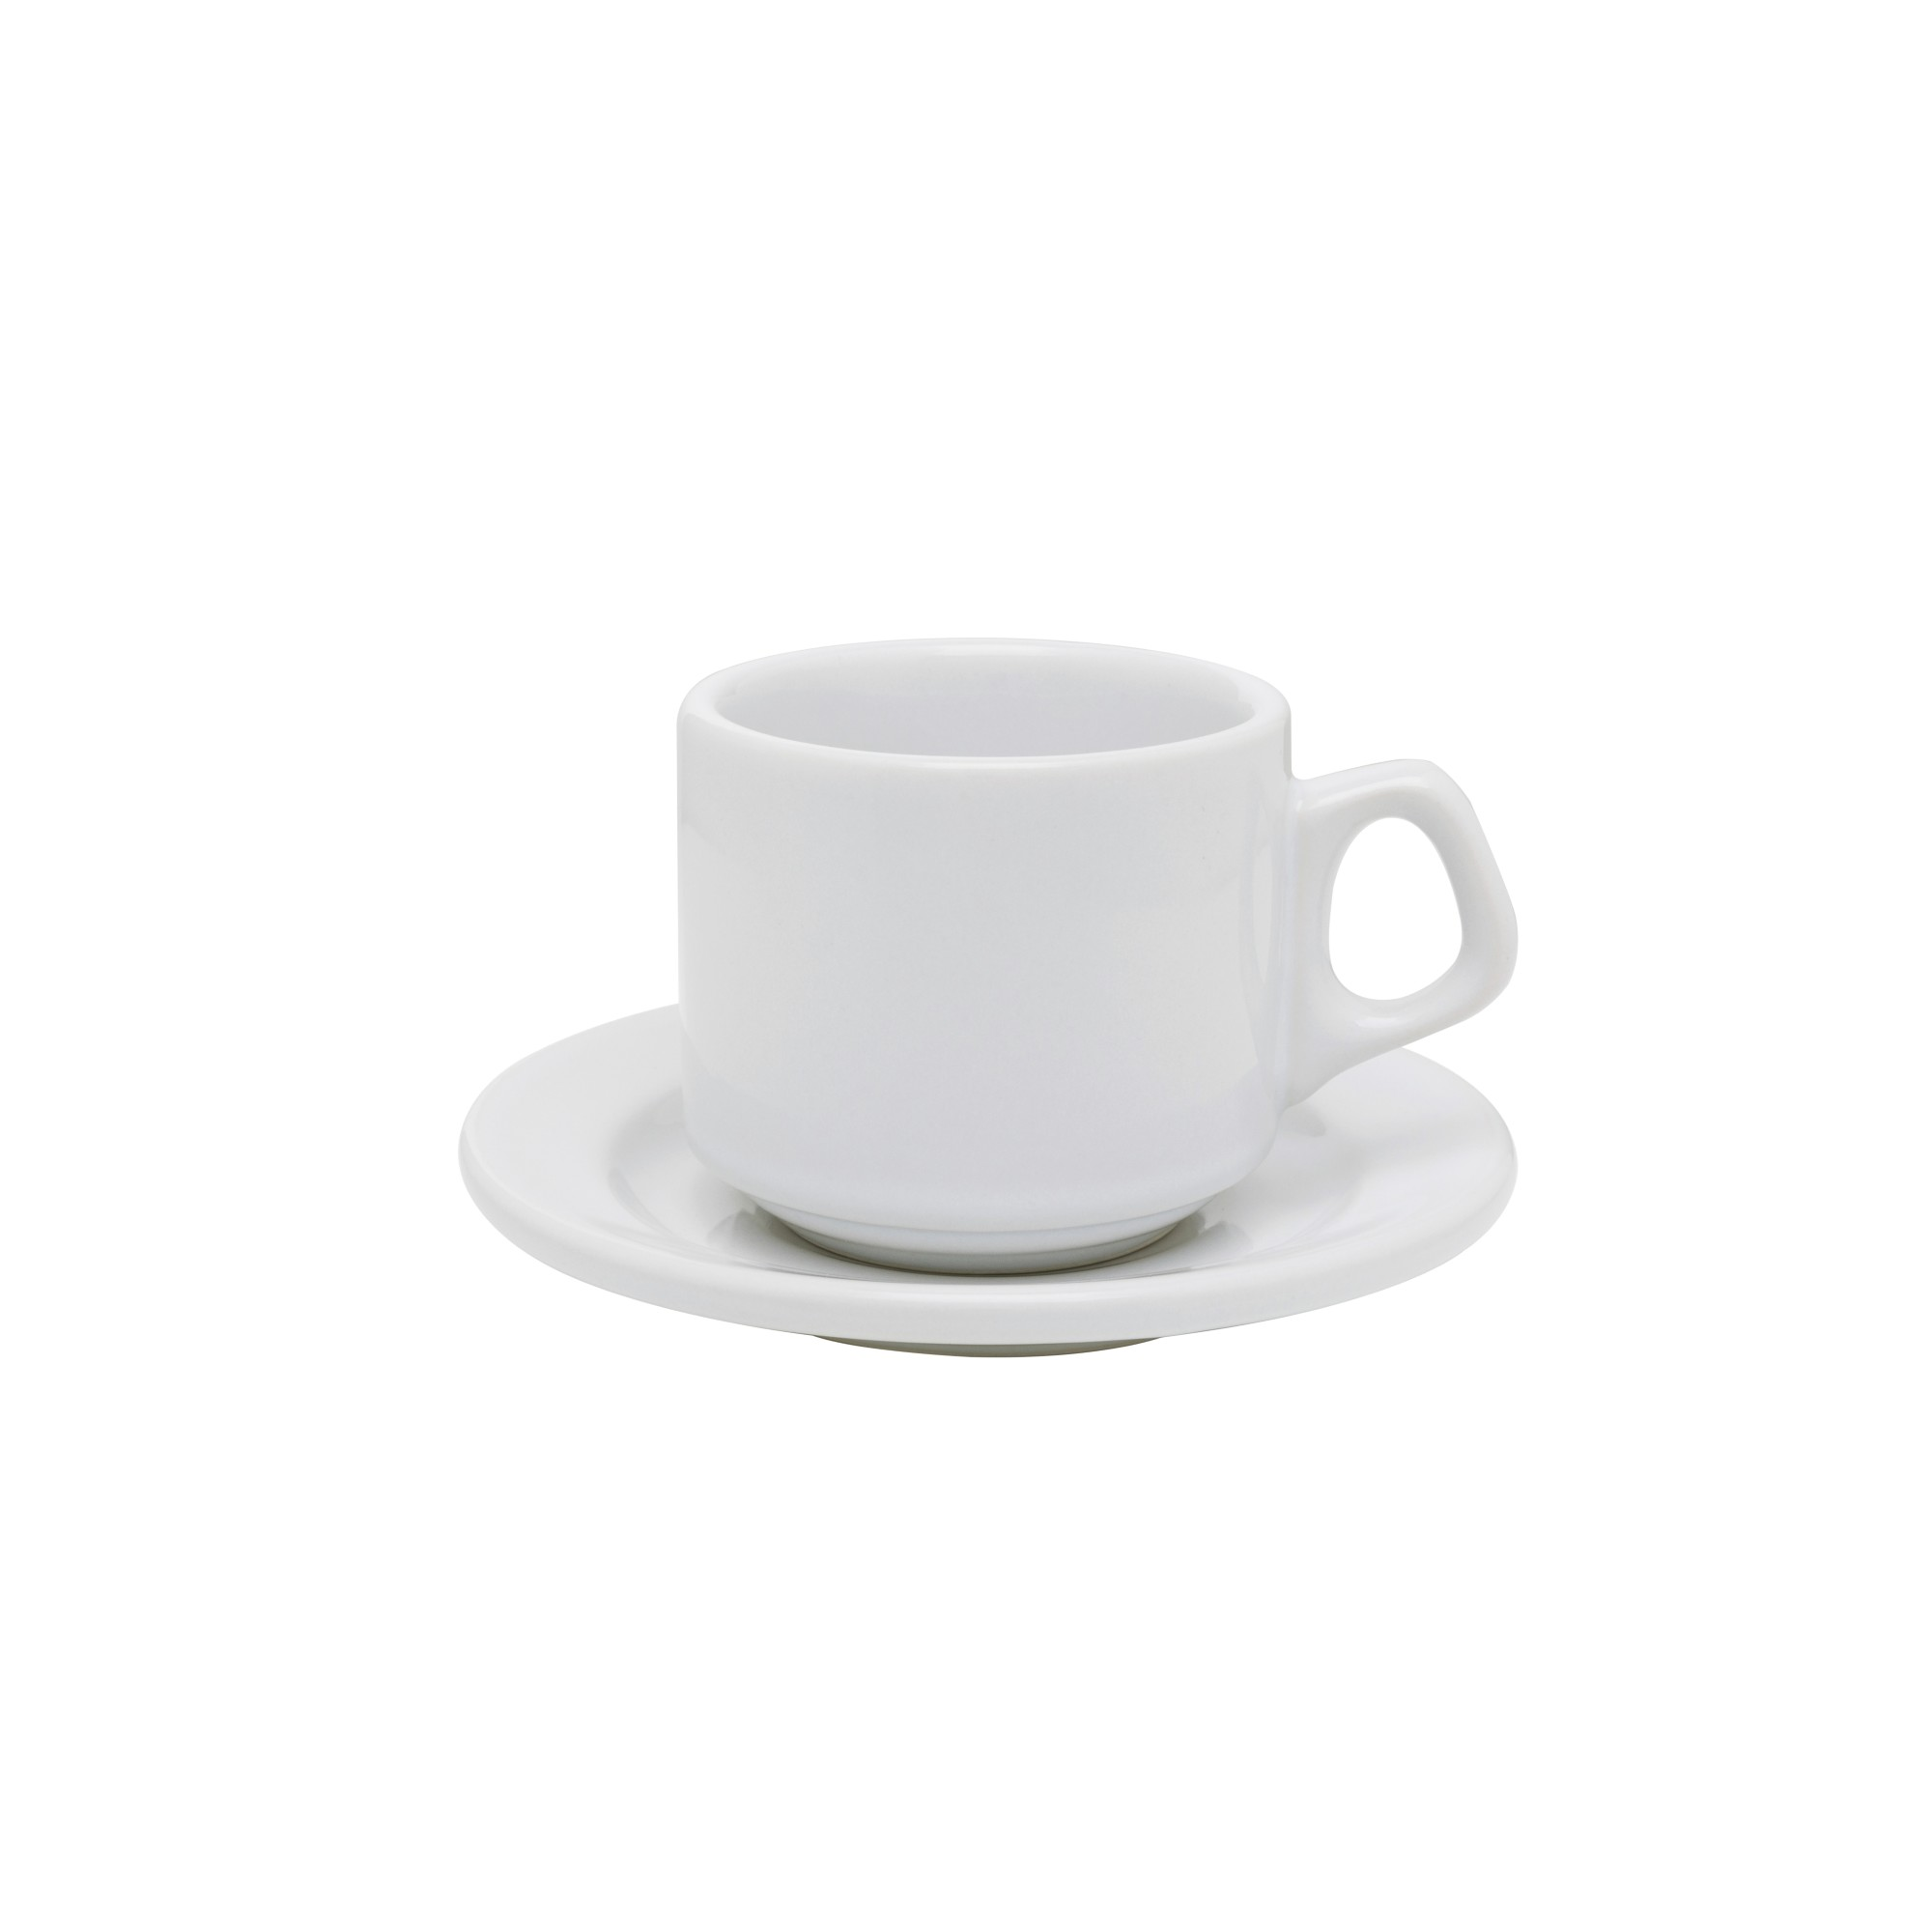 Xicara de Cha Ceramica 180ml com Pires Branca Vitramik - Oxford